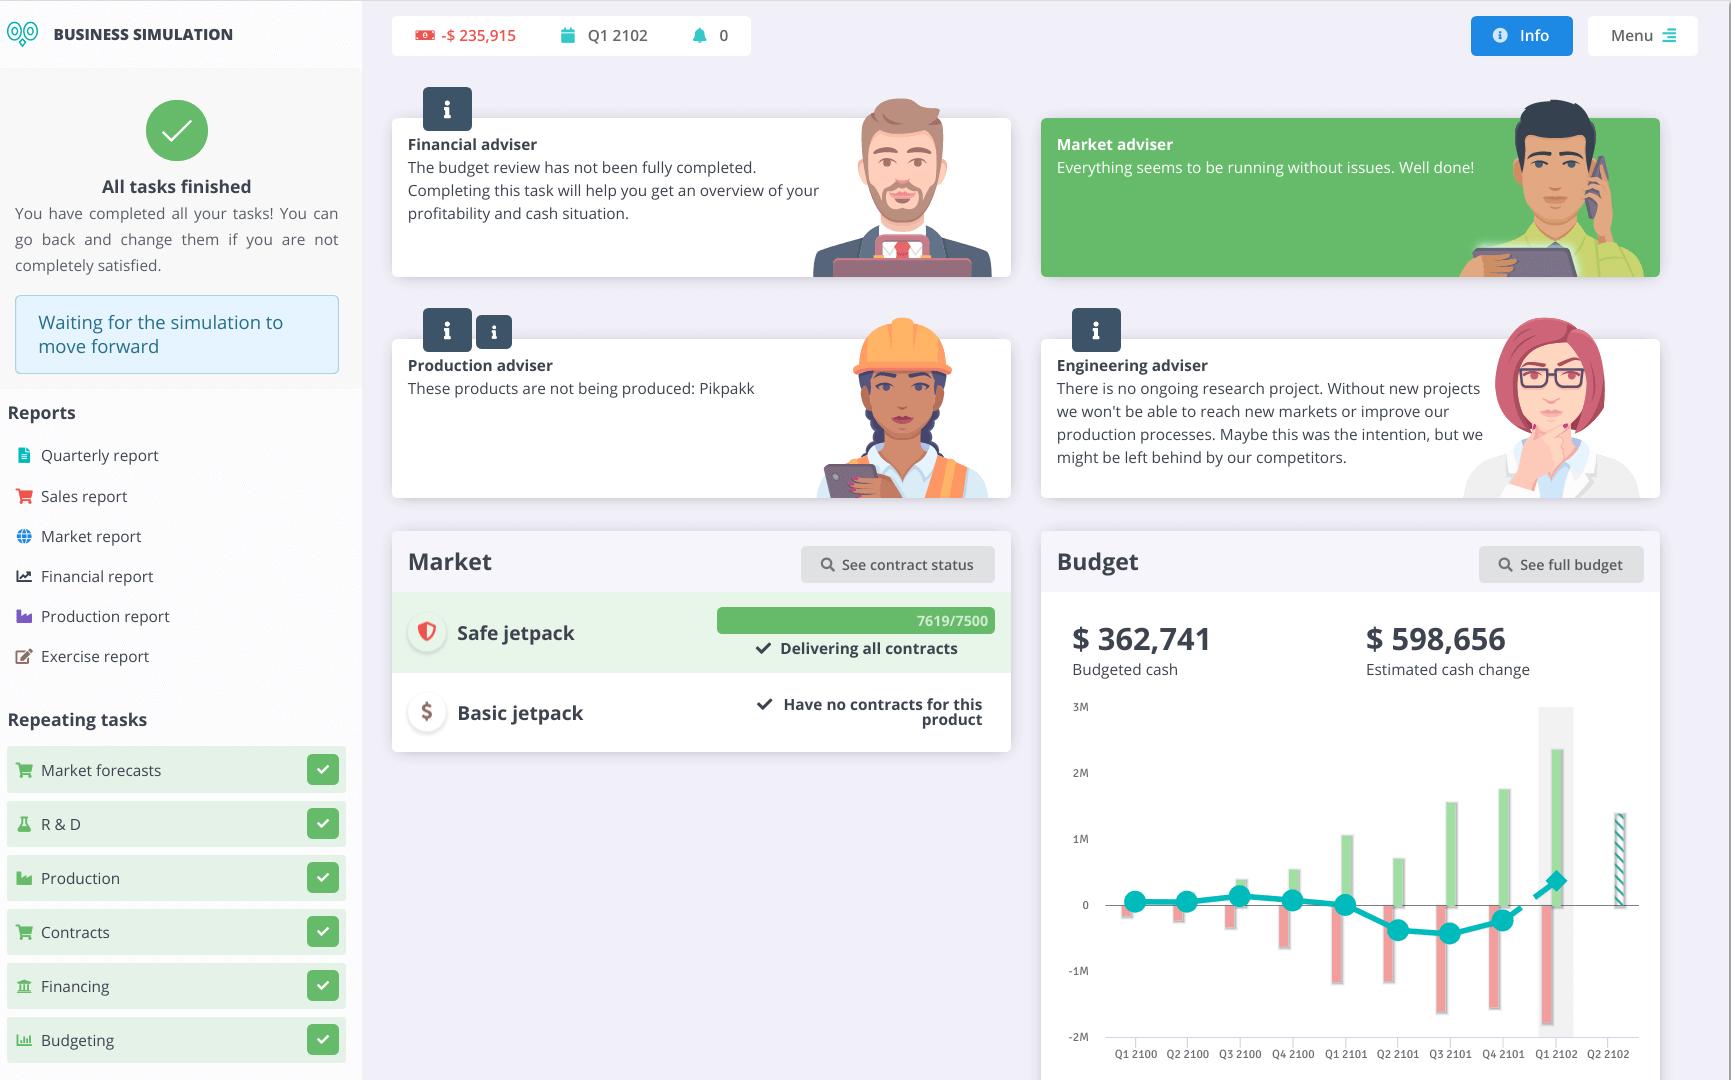 Hubro Business Simulation